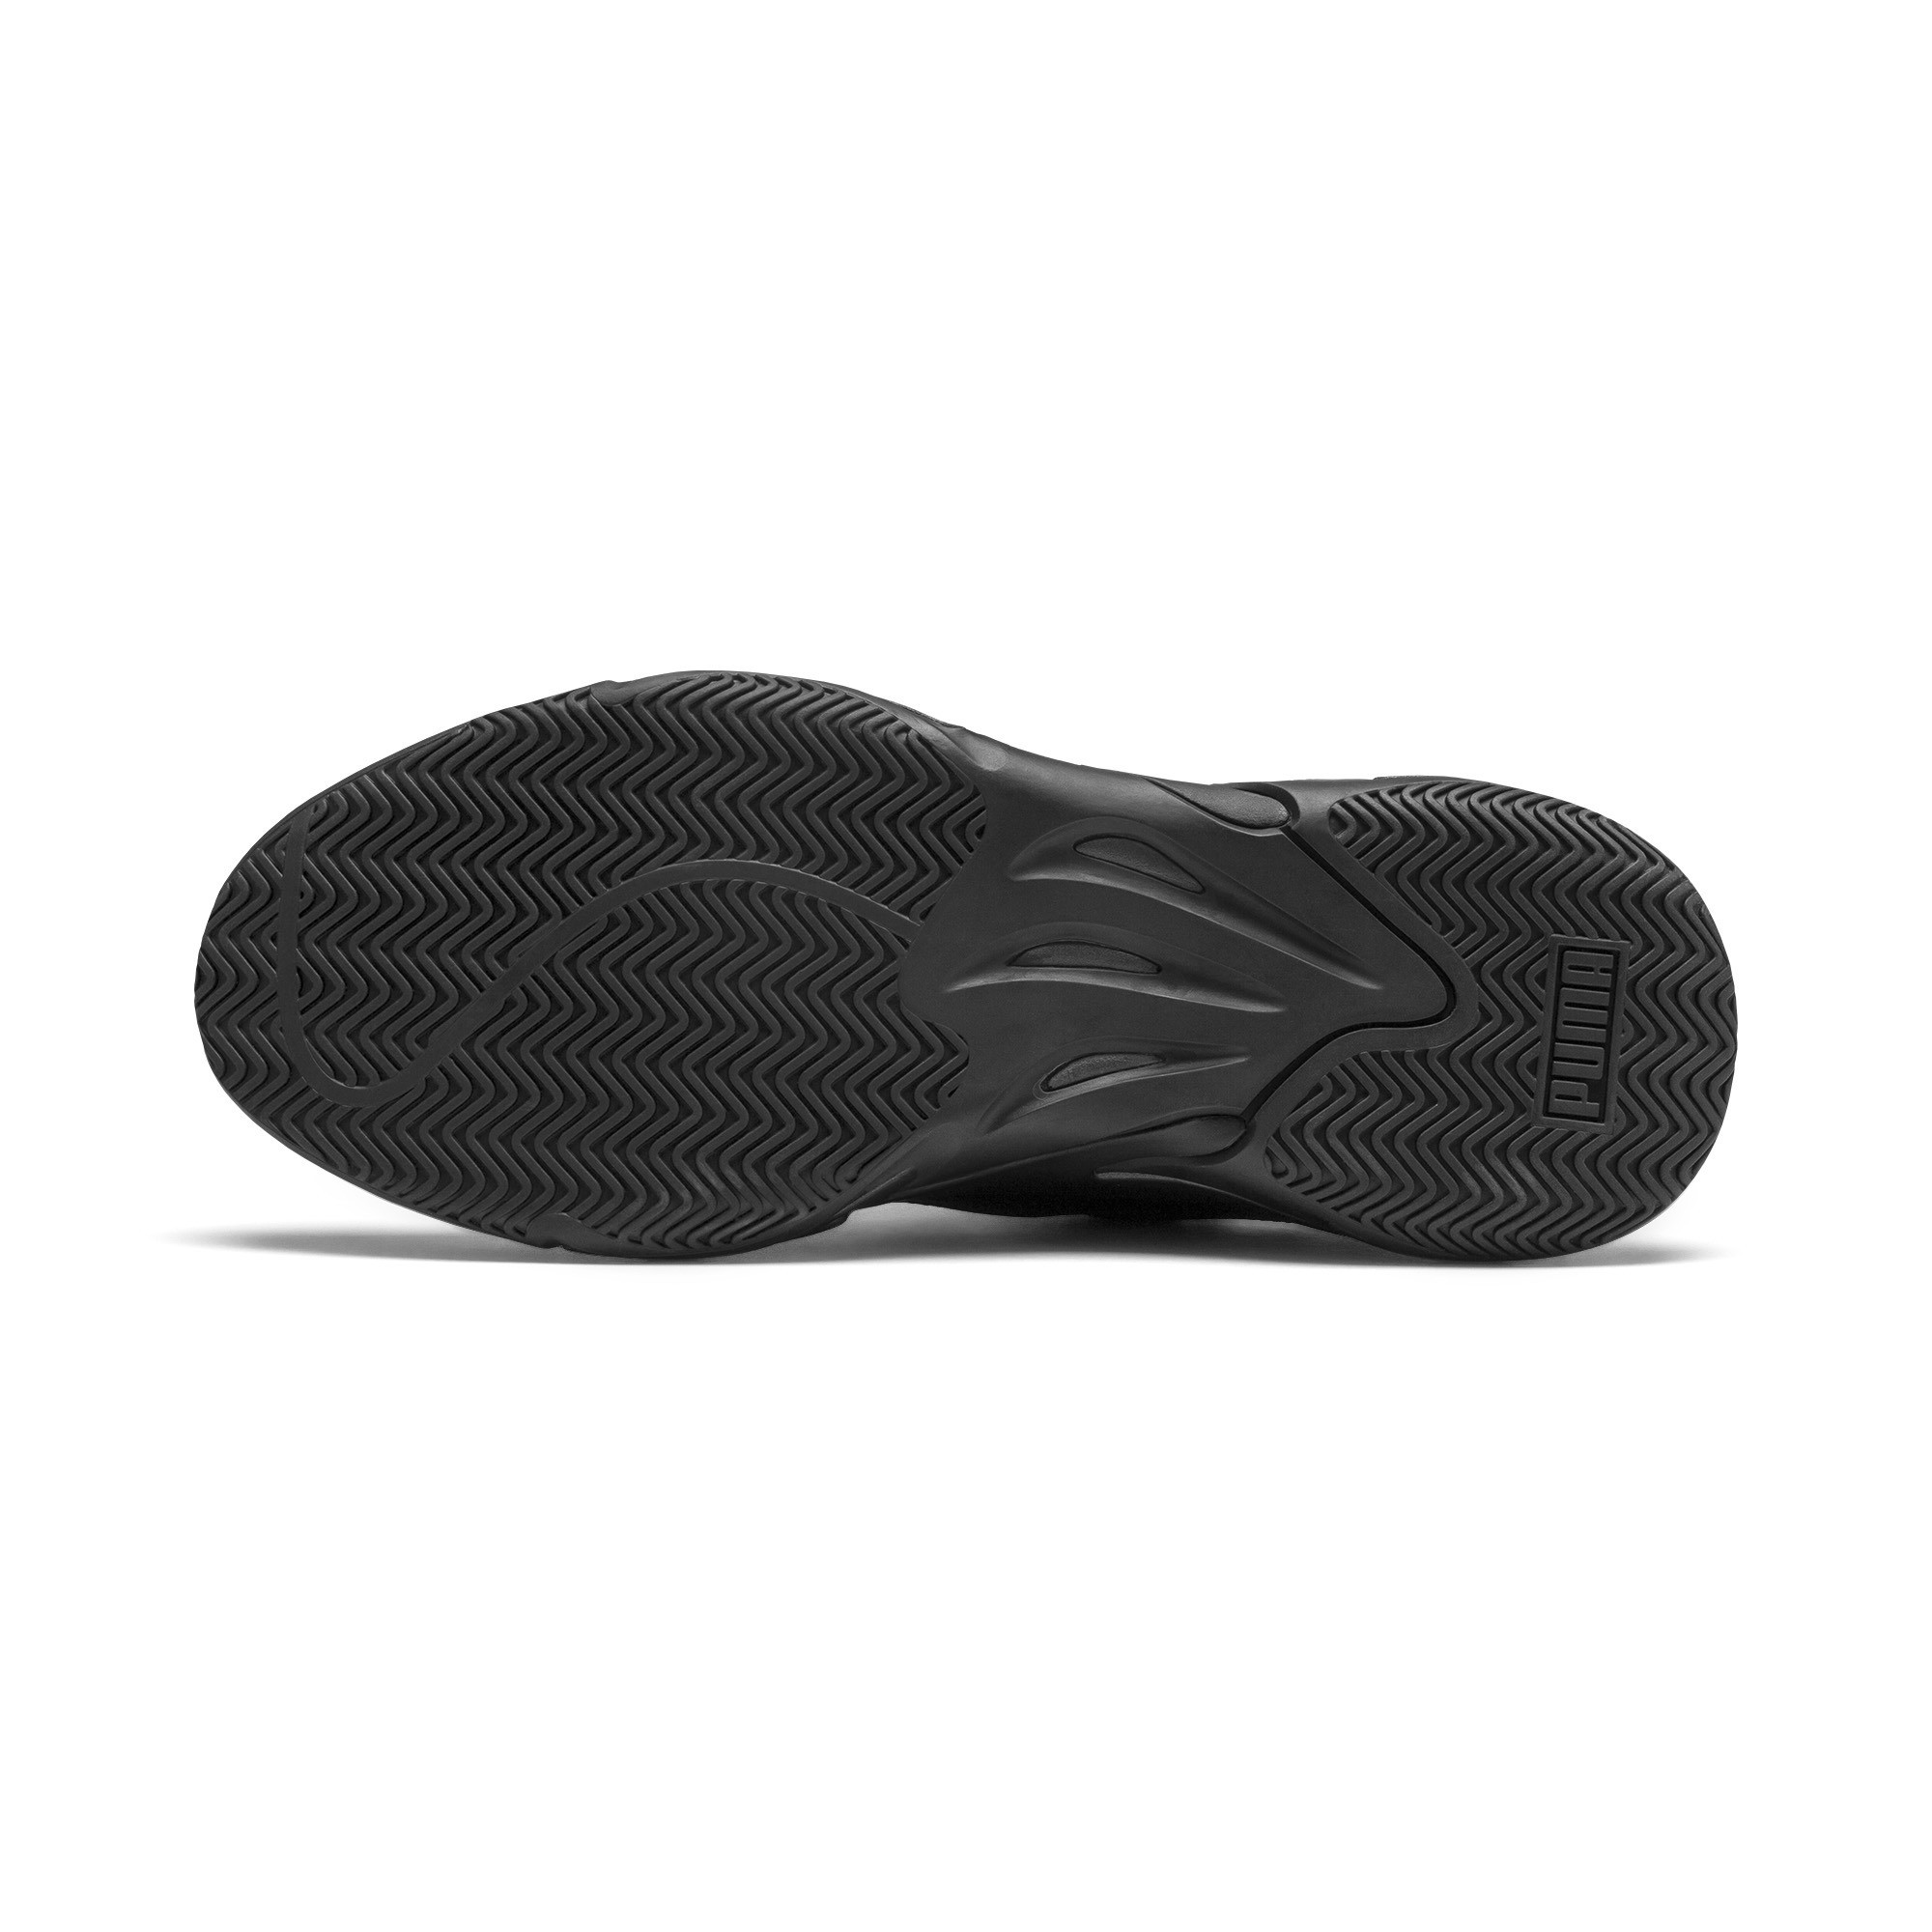 PUMA-Storm-Origin-Sneakers-Unisex-Shoe-Evolution thumbnail 6